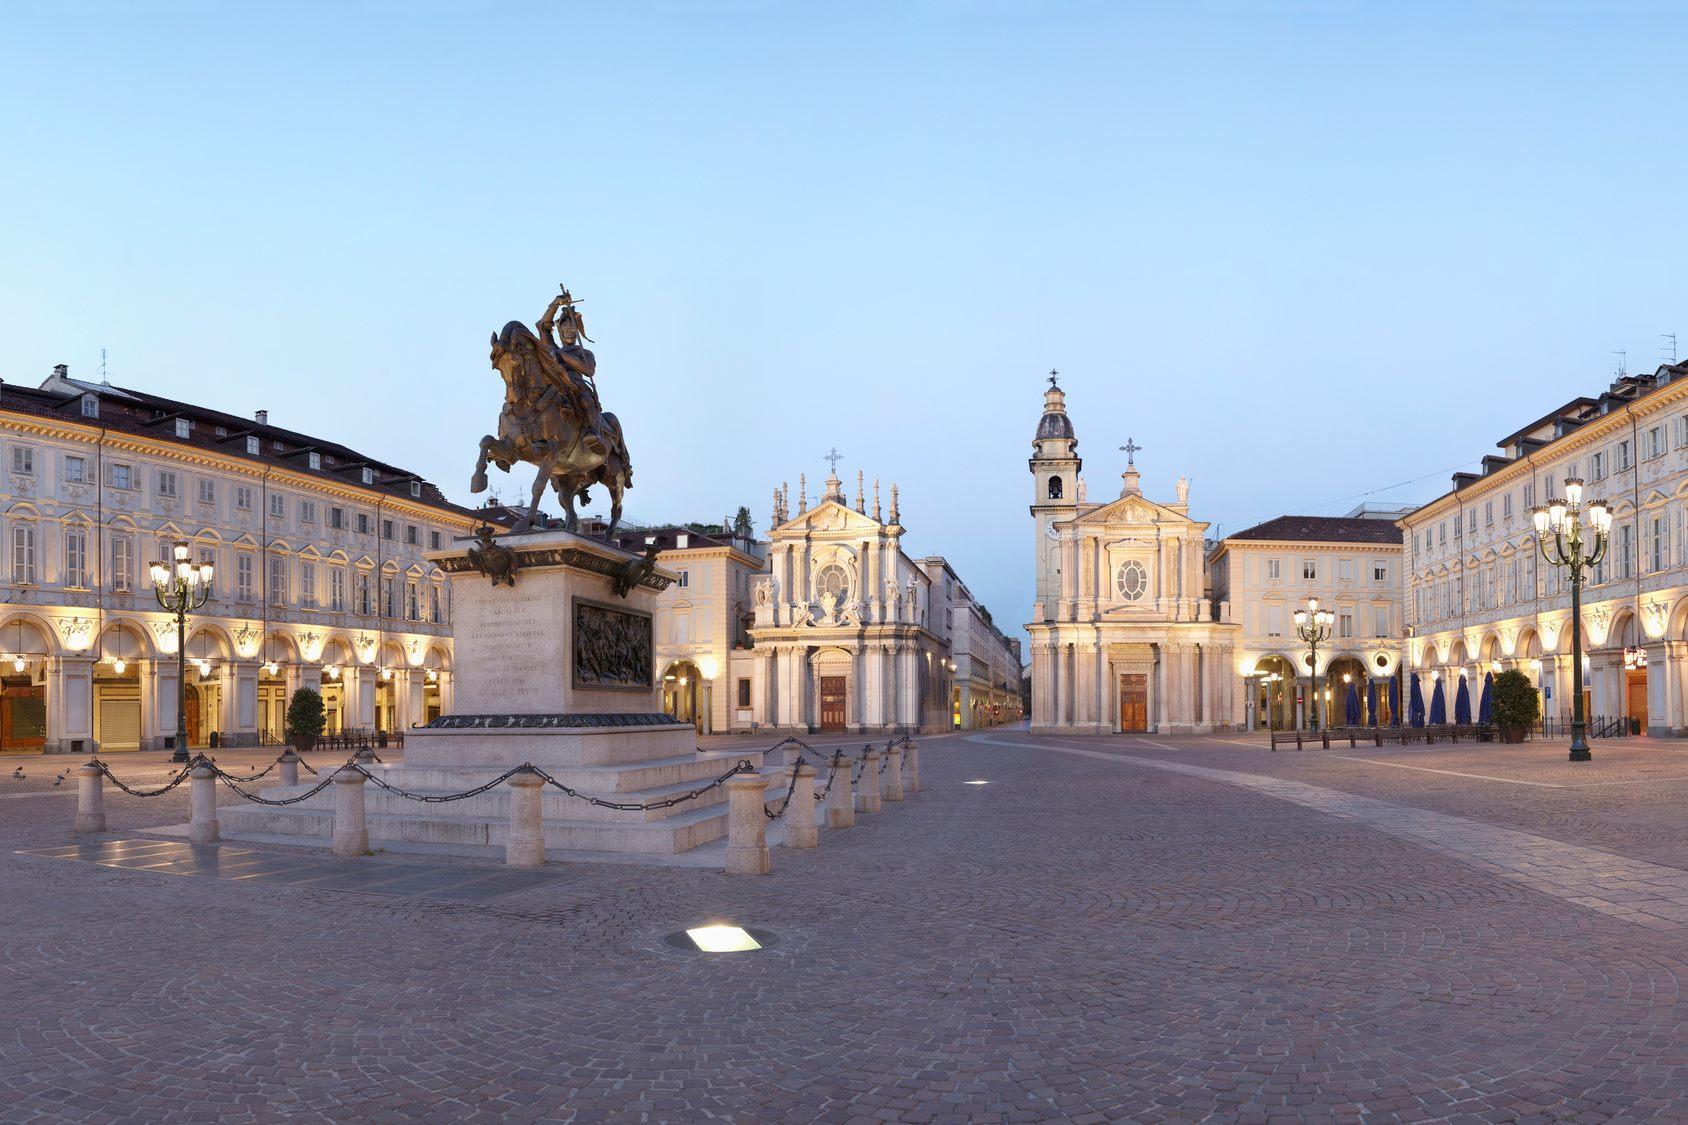 torino-piazza-s-carlo